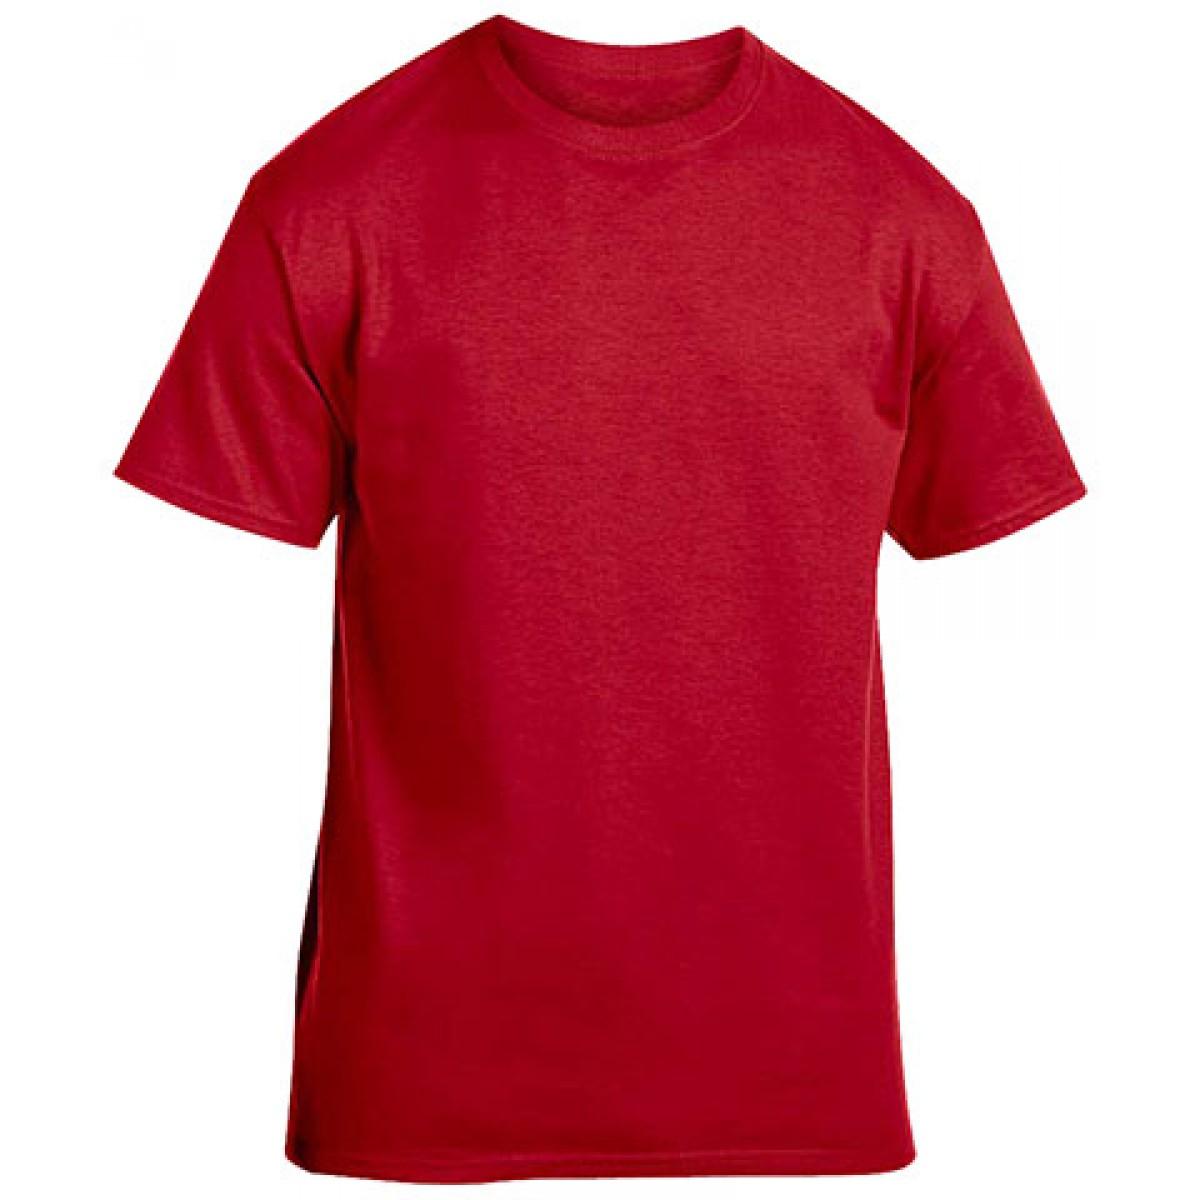 Cotton Short Sleeve T-Shirt-Cardinal Red-YS